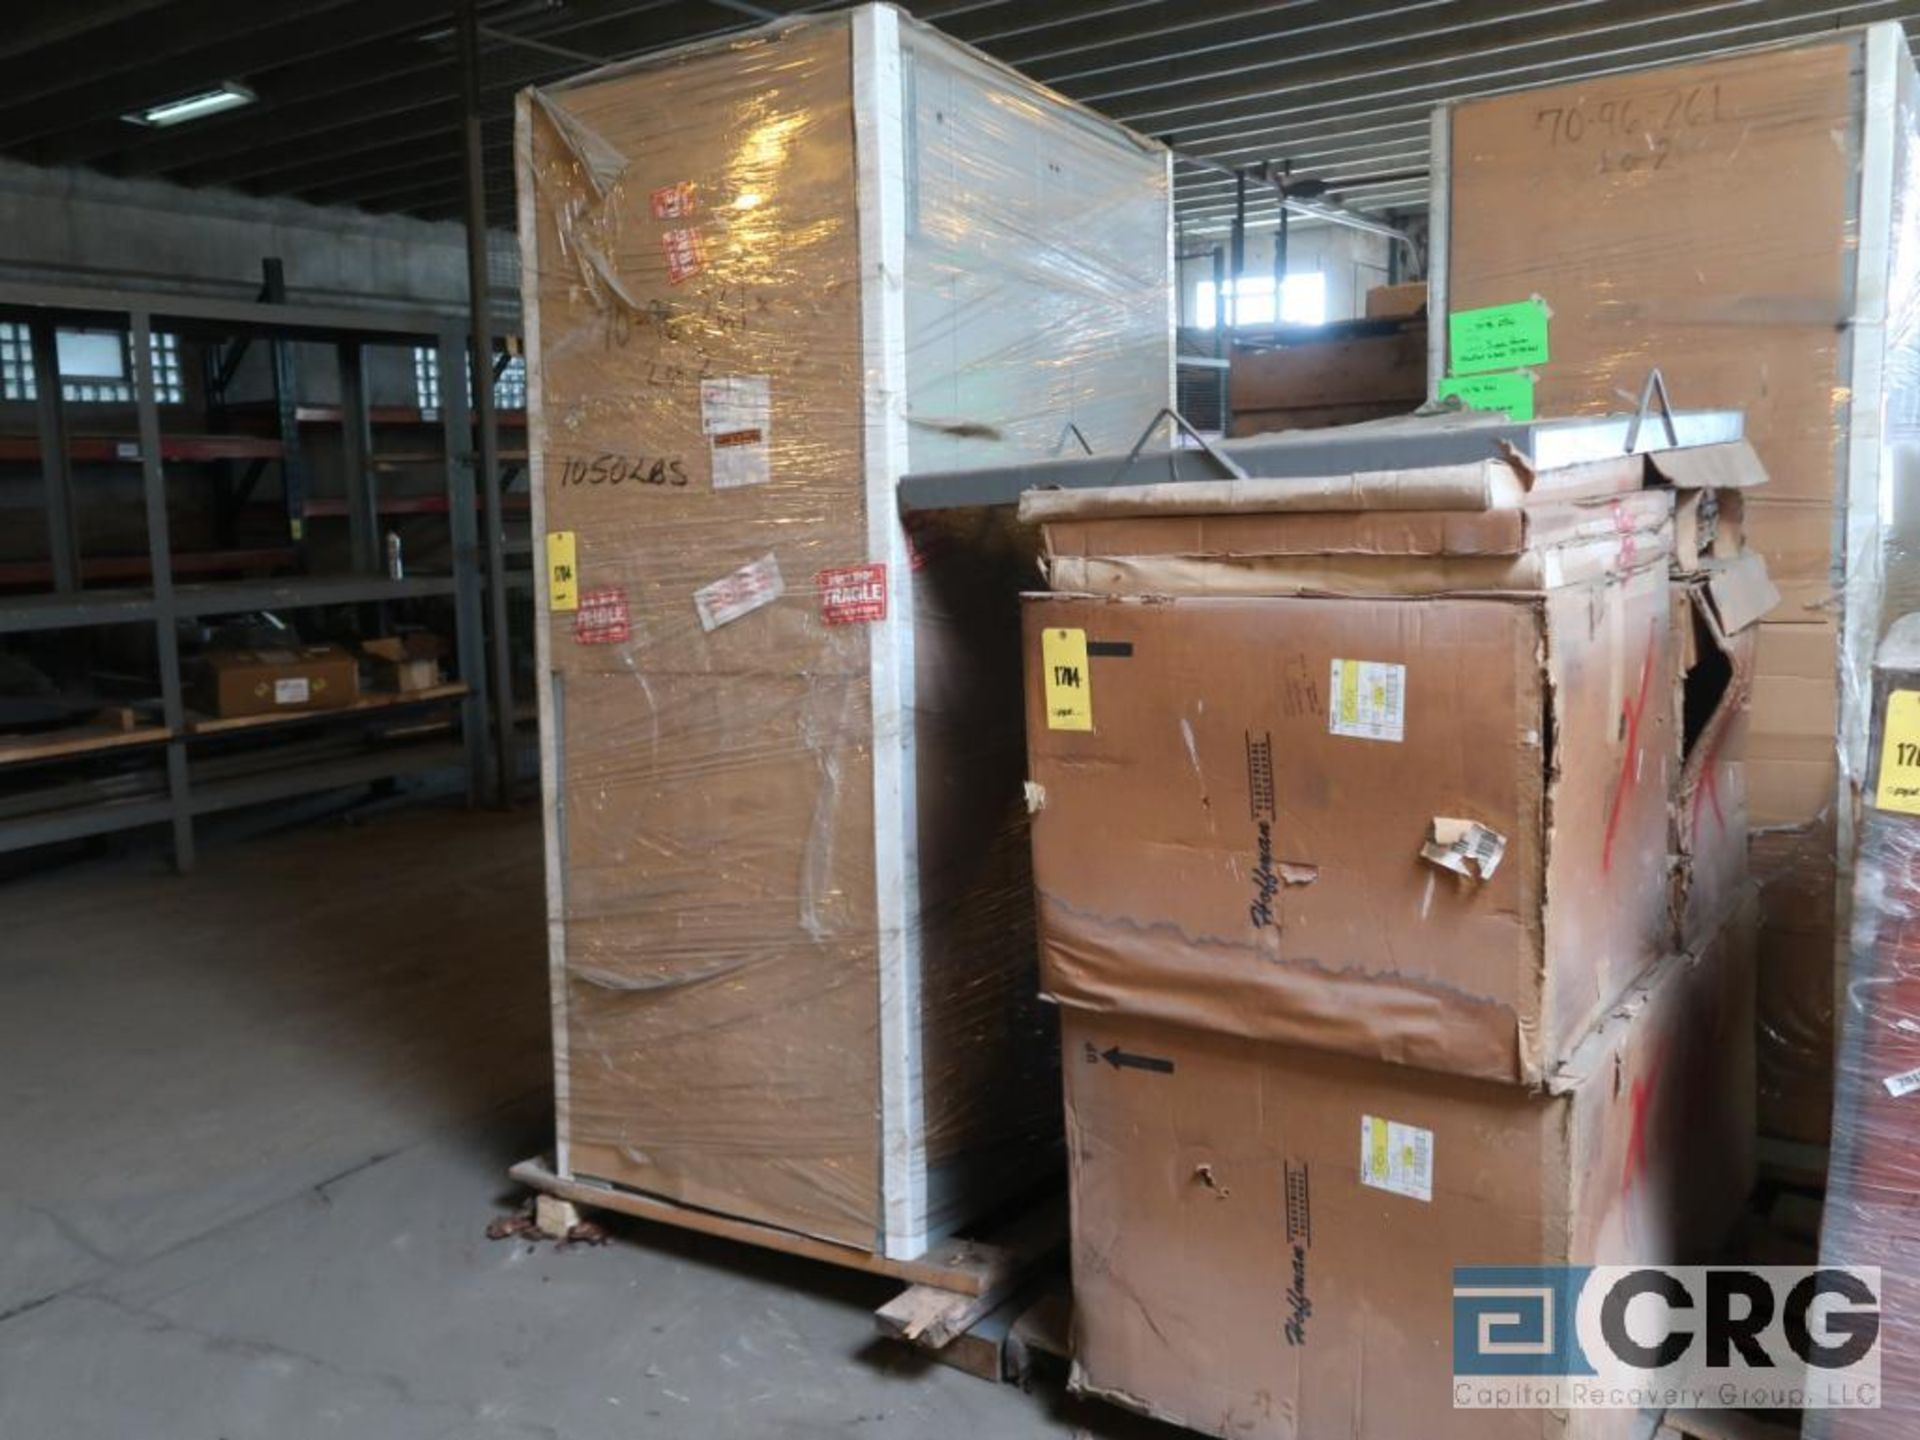 Uniclad 2000 KVA dry type transformer, 3 ph., HV 22860, BIL .125 KV, LV 480 GRDY/277 BIL. 10 KV, (5) - Image 2 of 4